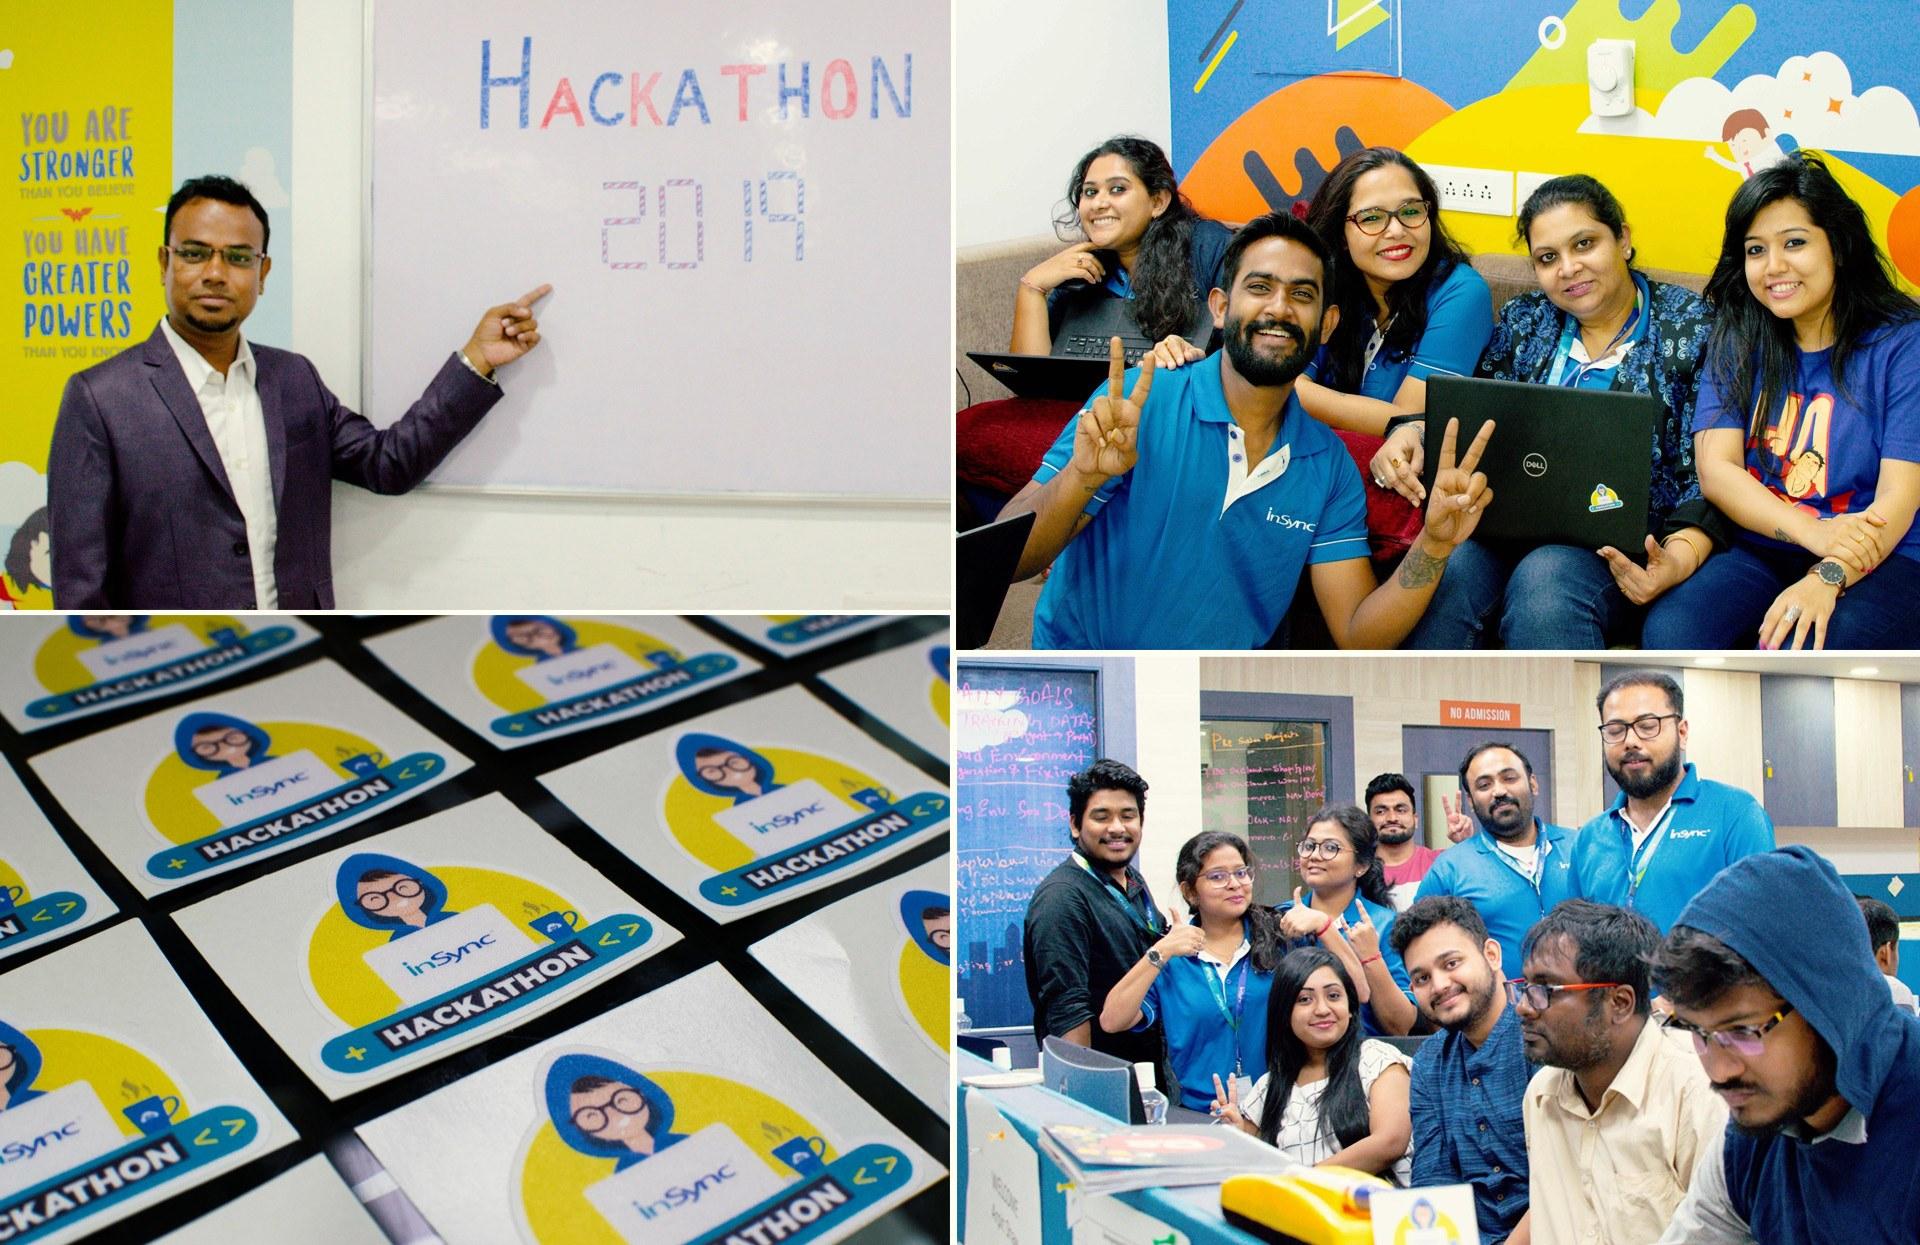 hackathon-insync-2019-1